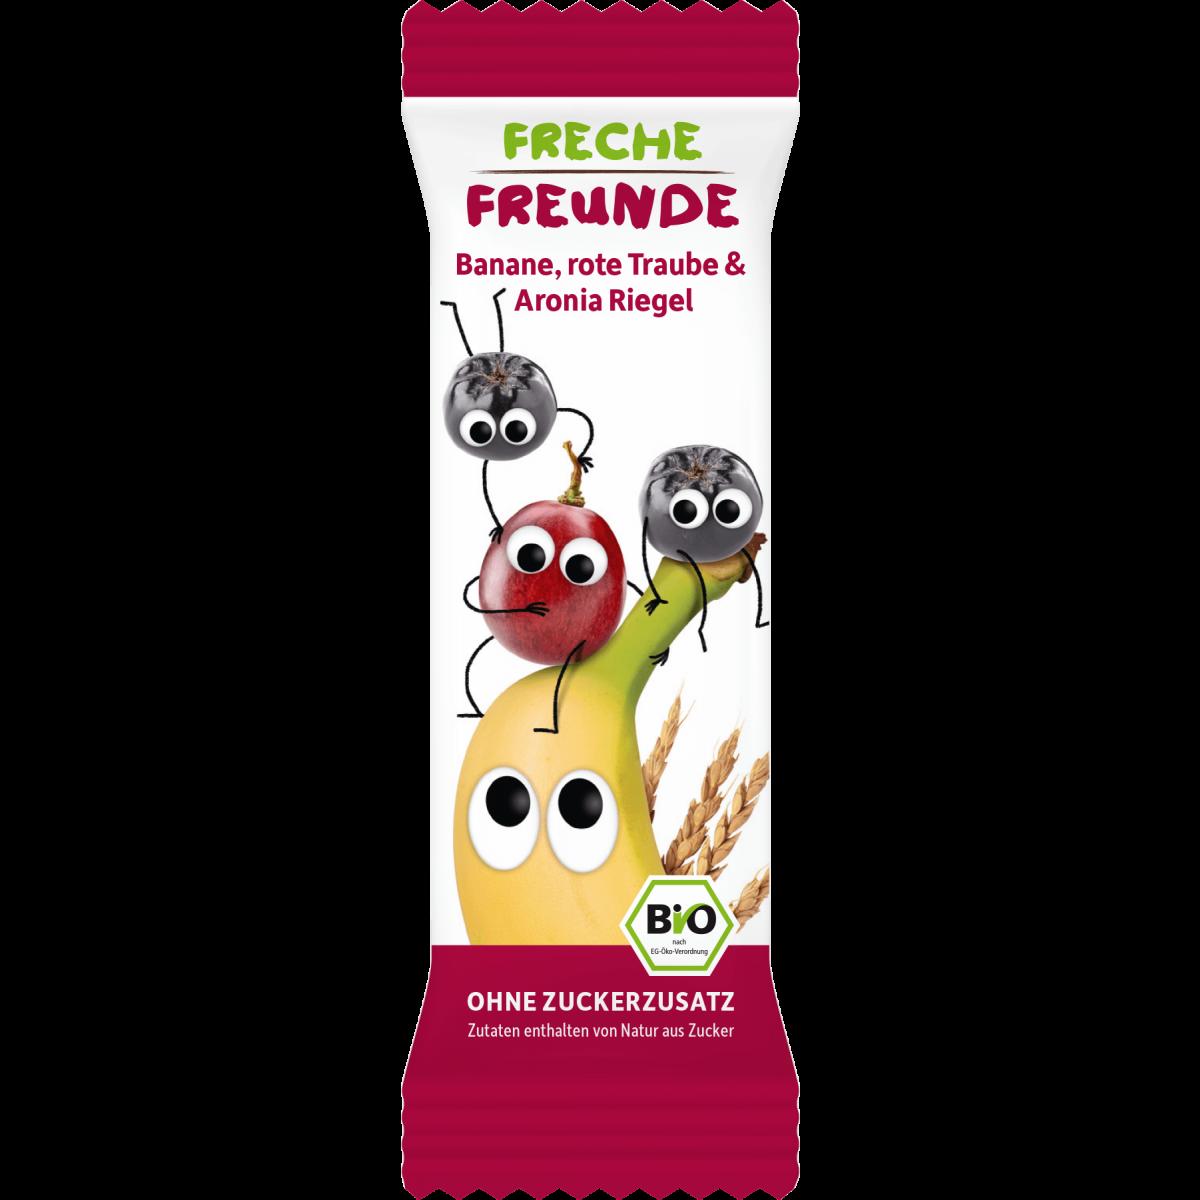 Freche Freunde Banane, rote Traube & Aronia Riegel 4 x 23g (6er Pack)